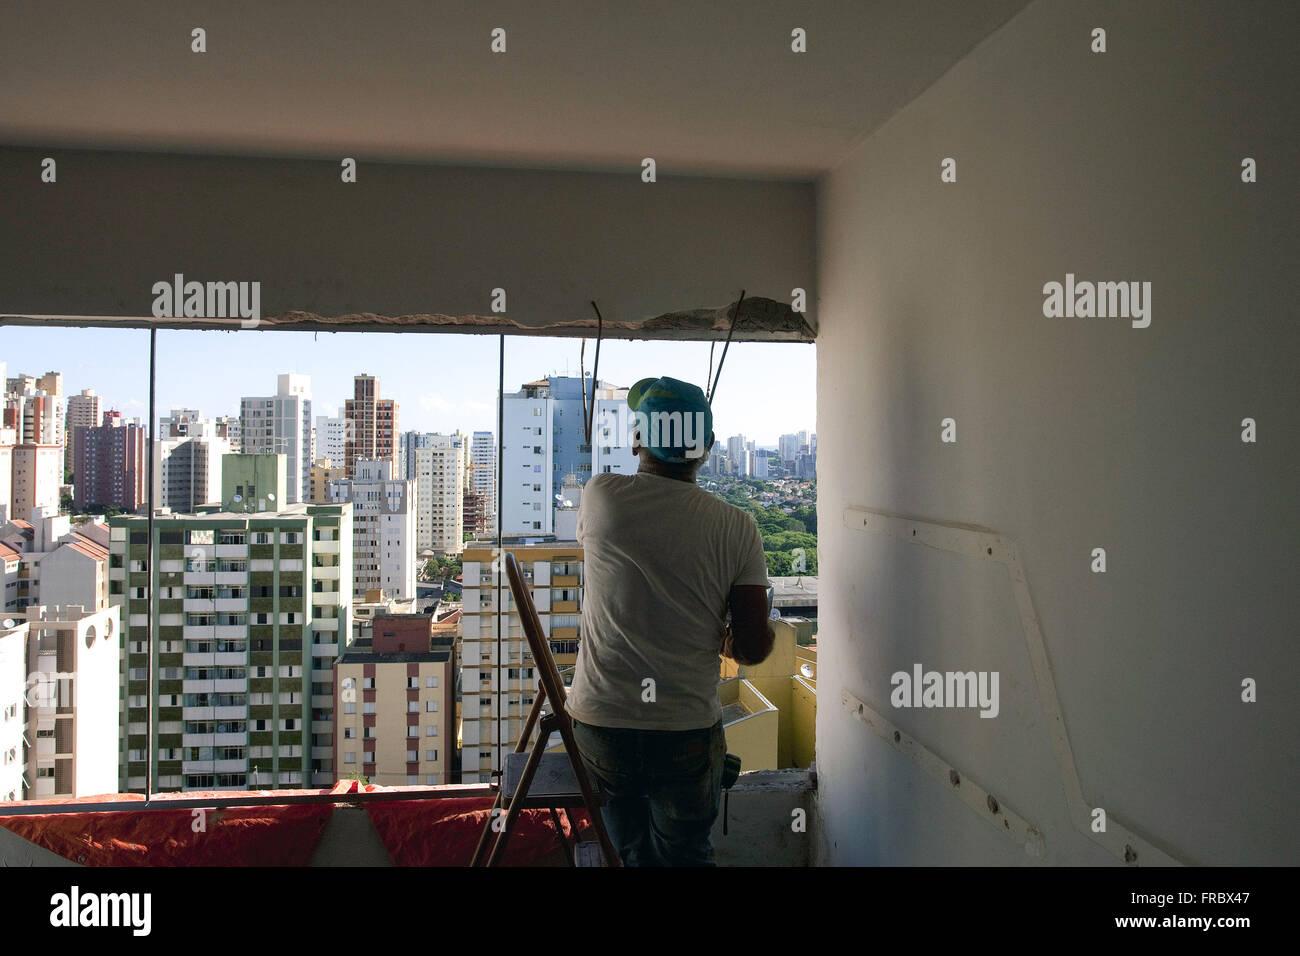 Mason exchanging apartment window - Stock Image